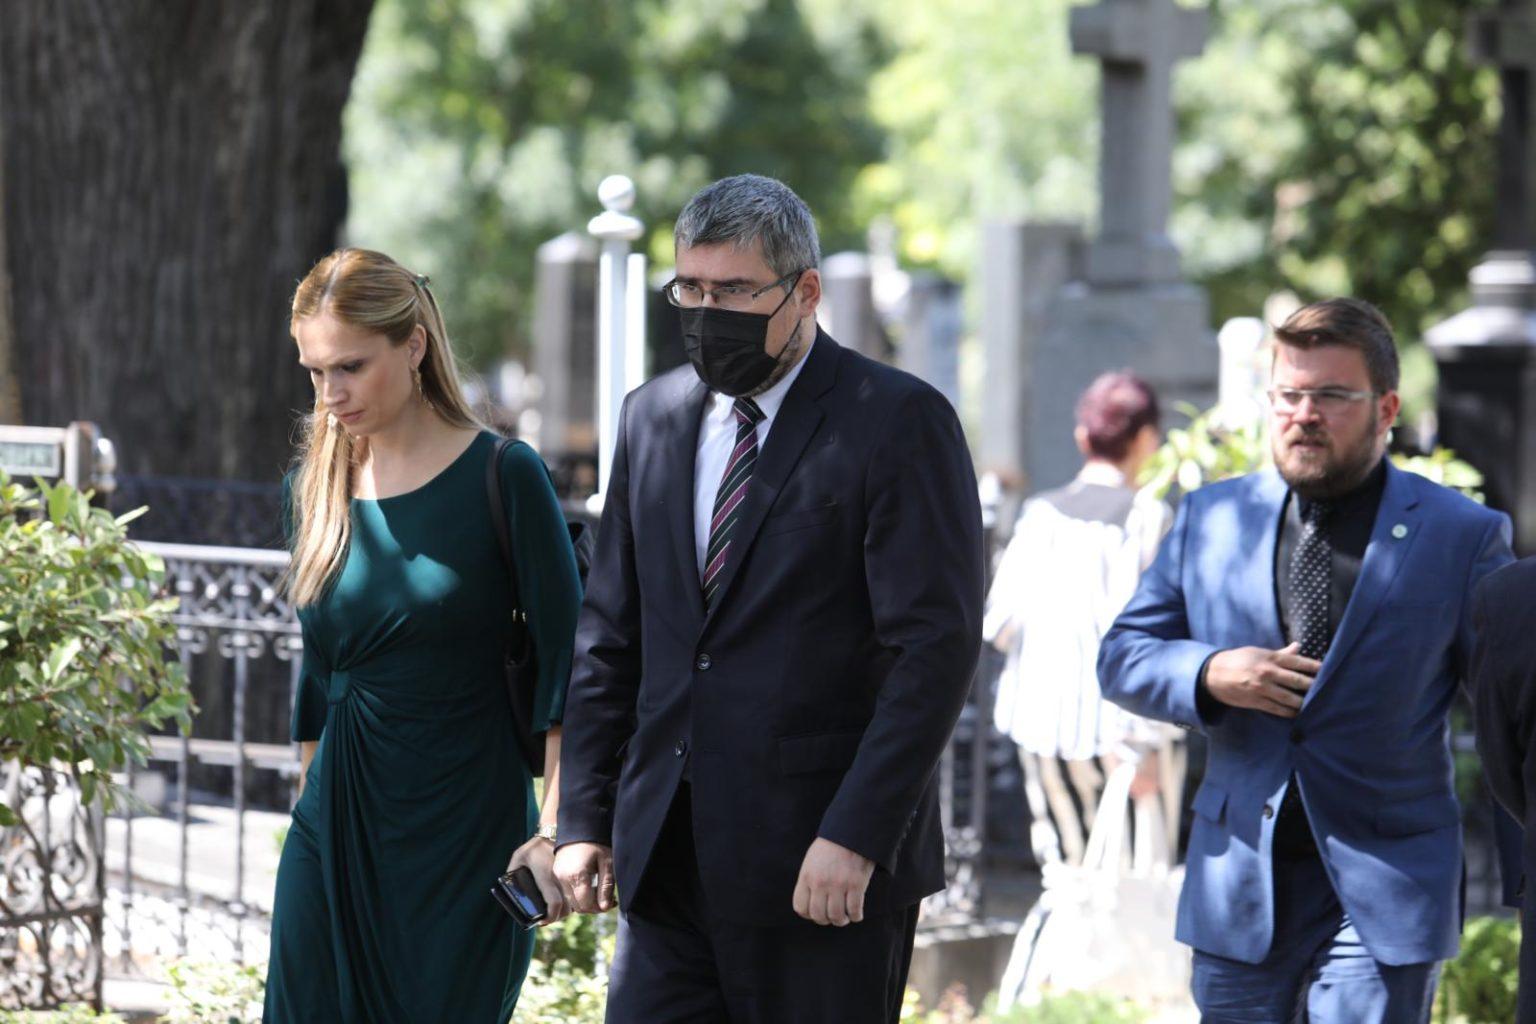 FOTO: Zoran Ilić/RAS Srbija